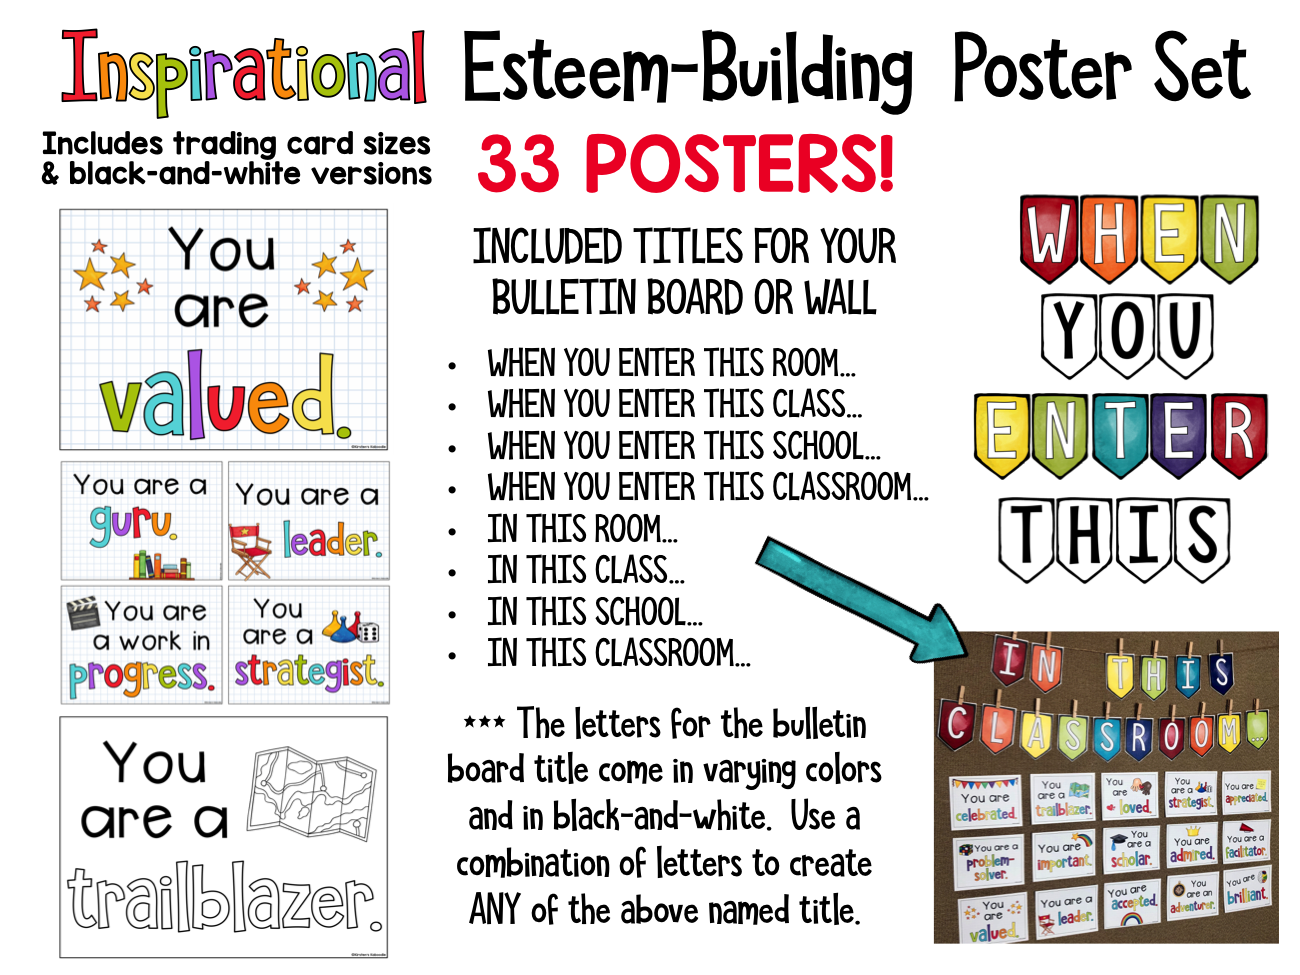 Inspirational Esteem-Building Poster Set